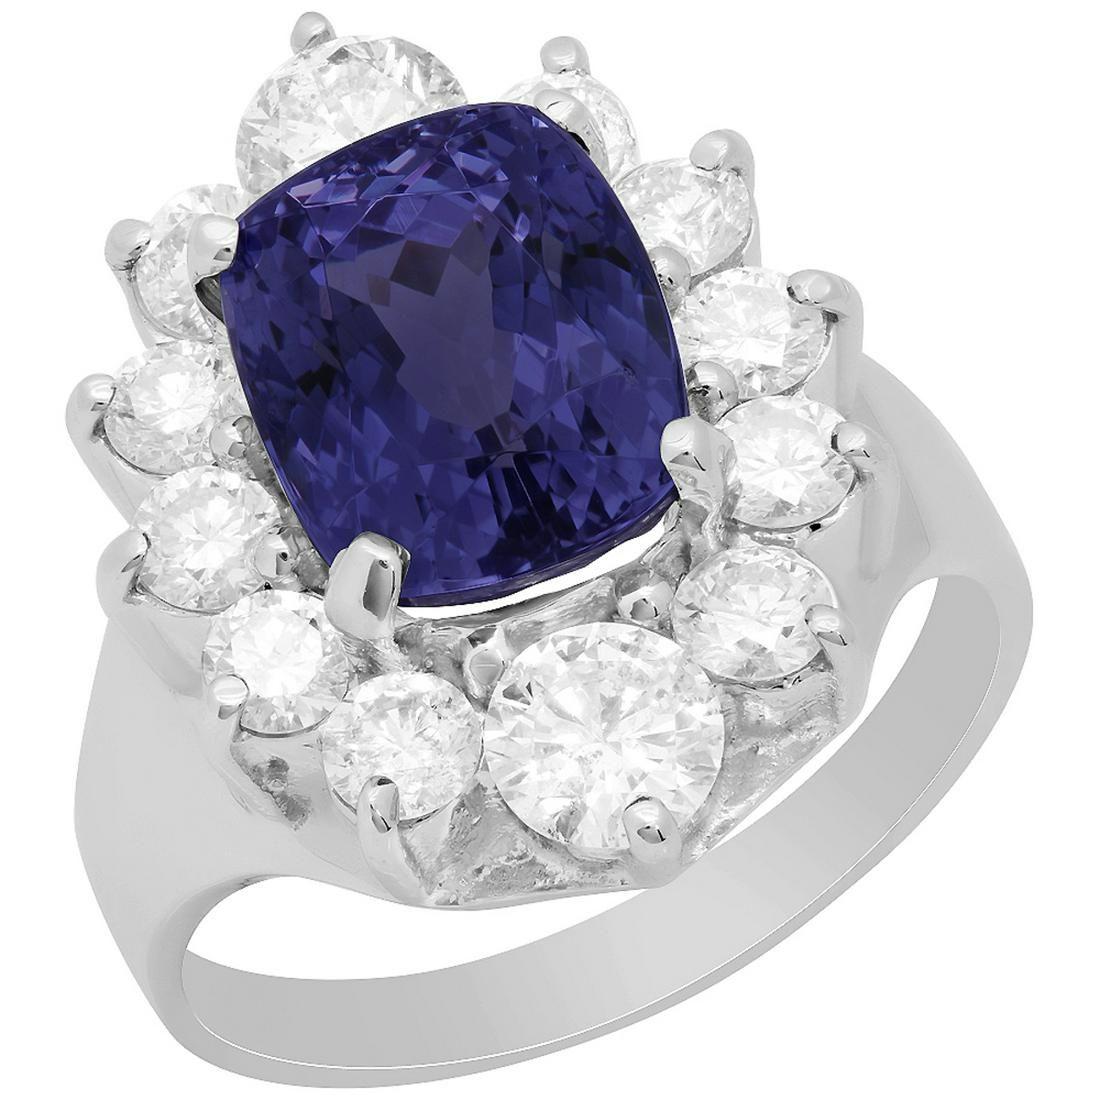 14k White Gold 4.52ct Tanzanite 1.71ct Diamond Ring